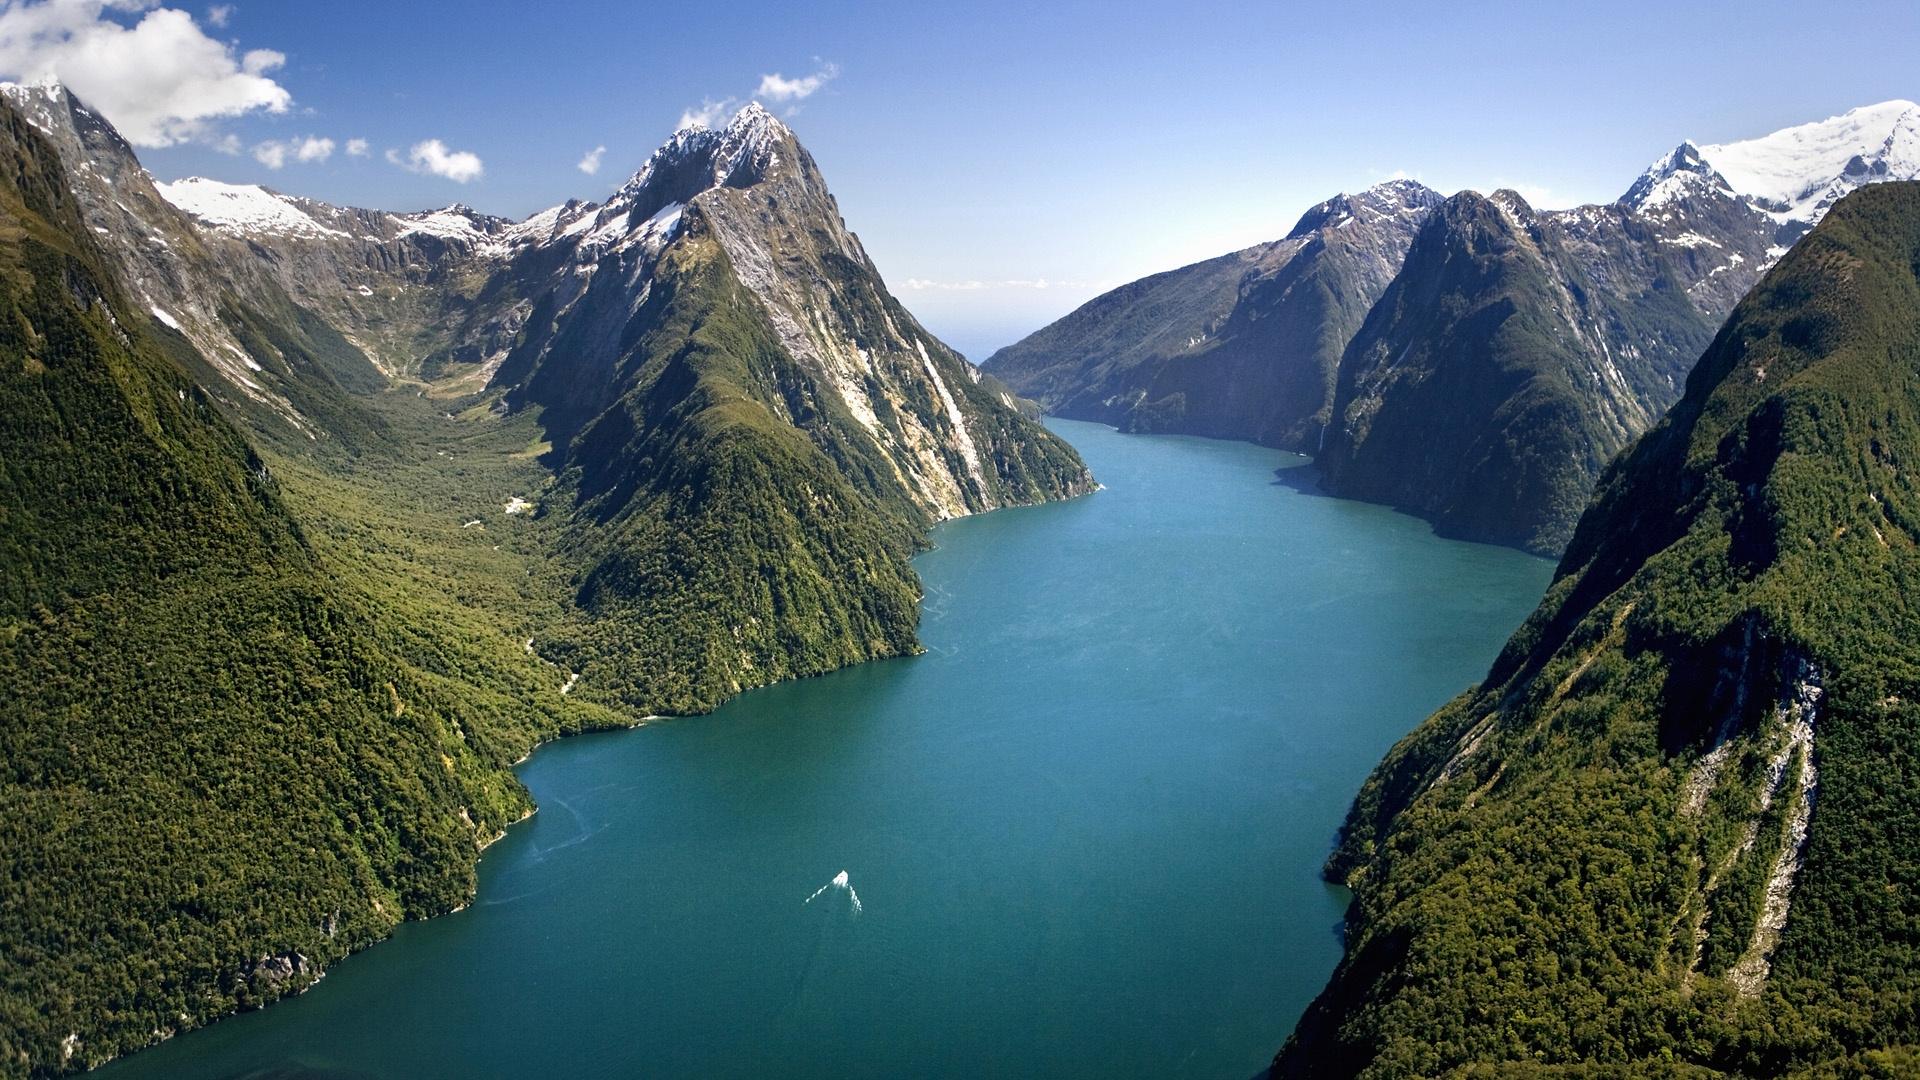 Лес горы и река картинки и обои (16)